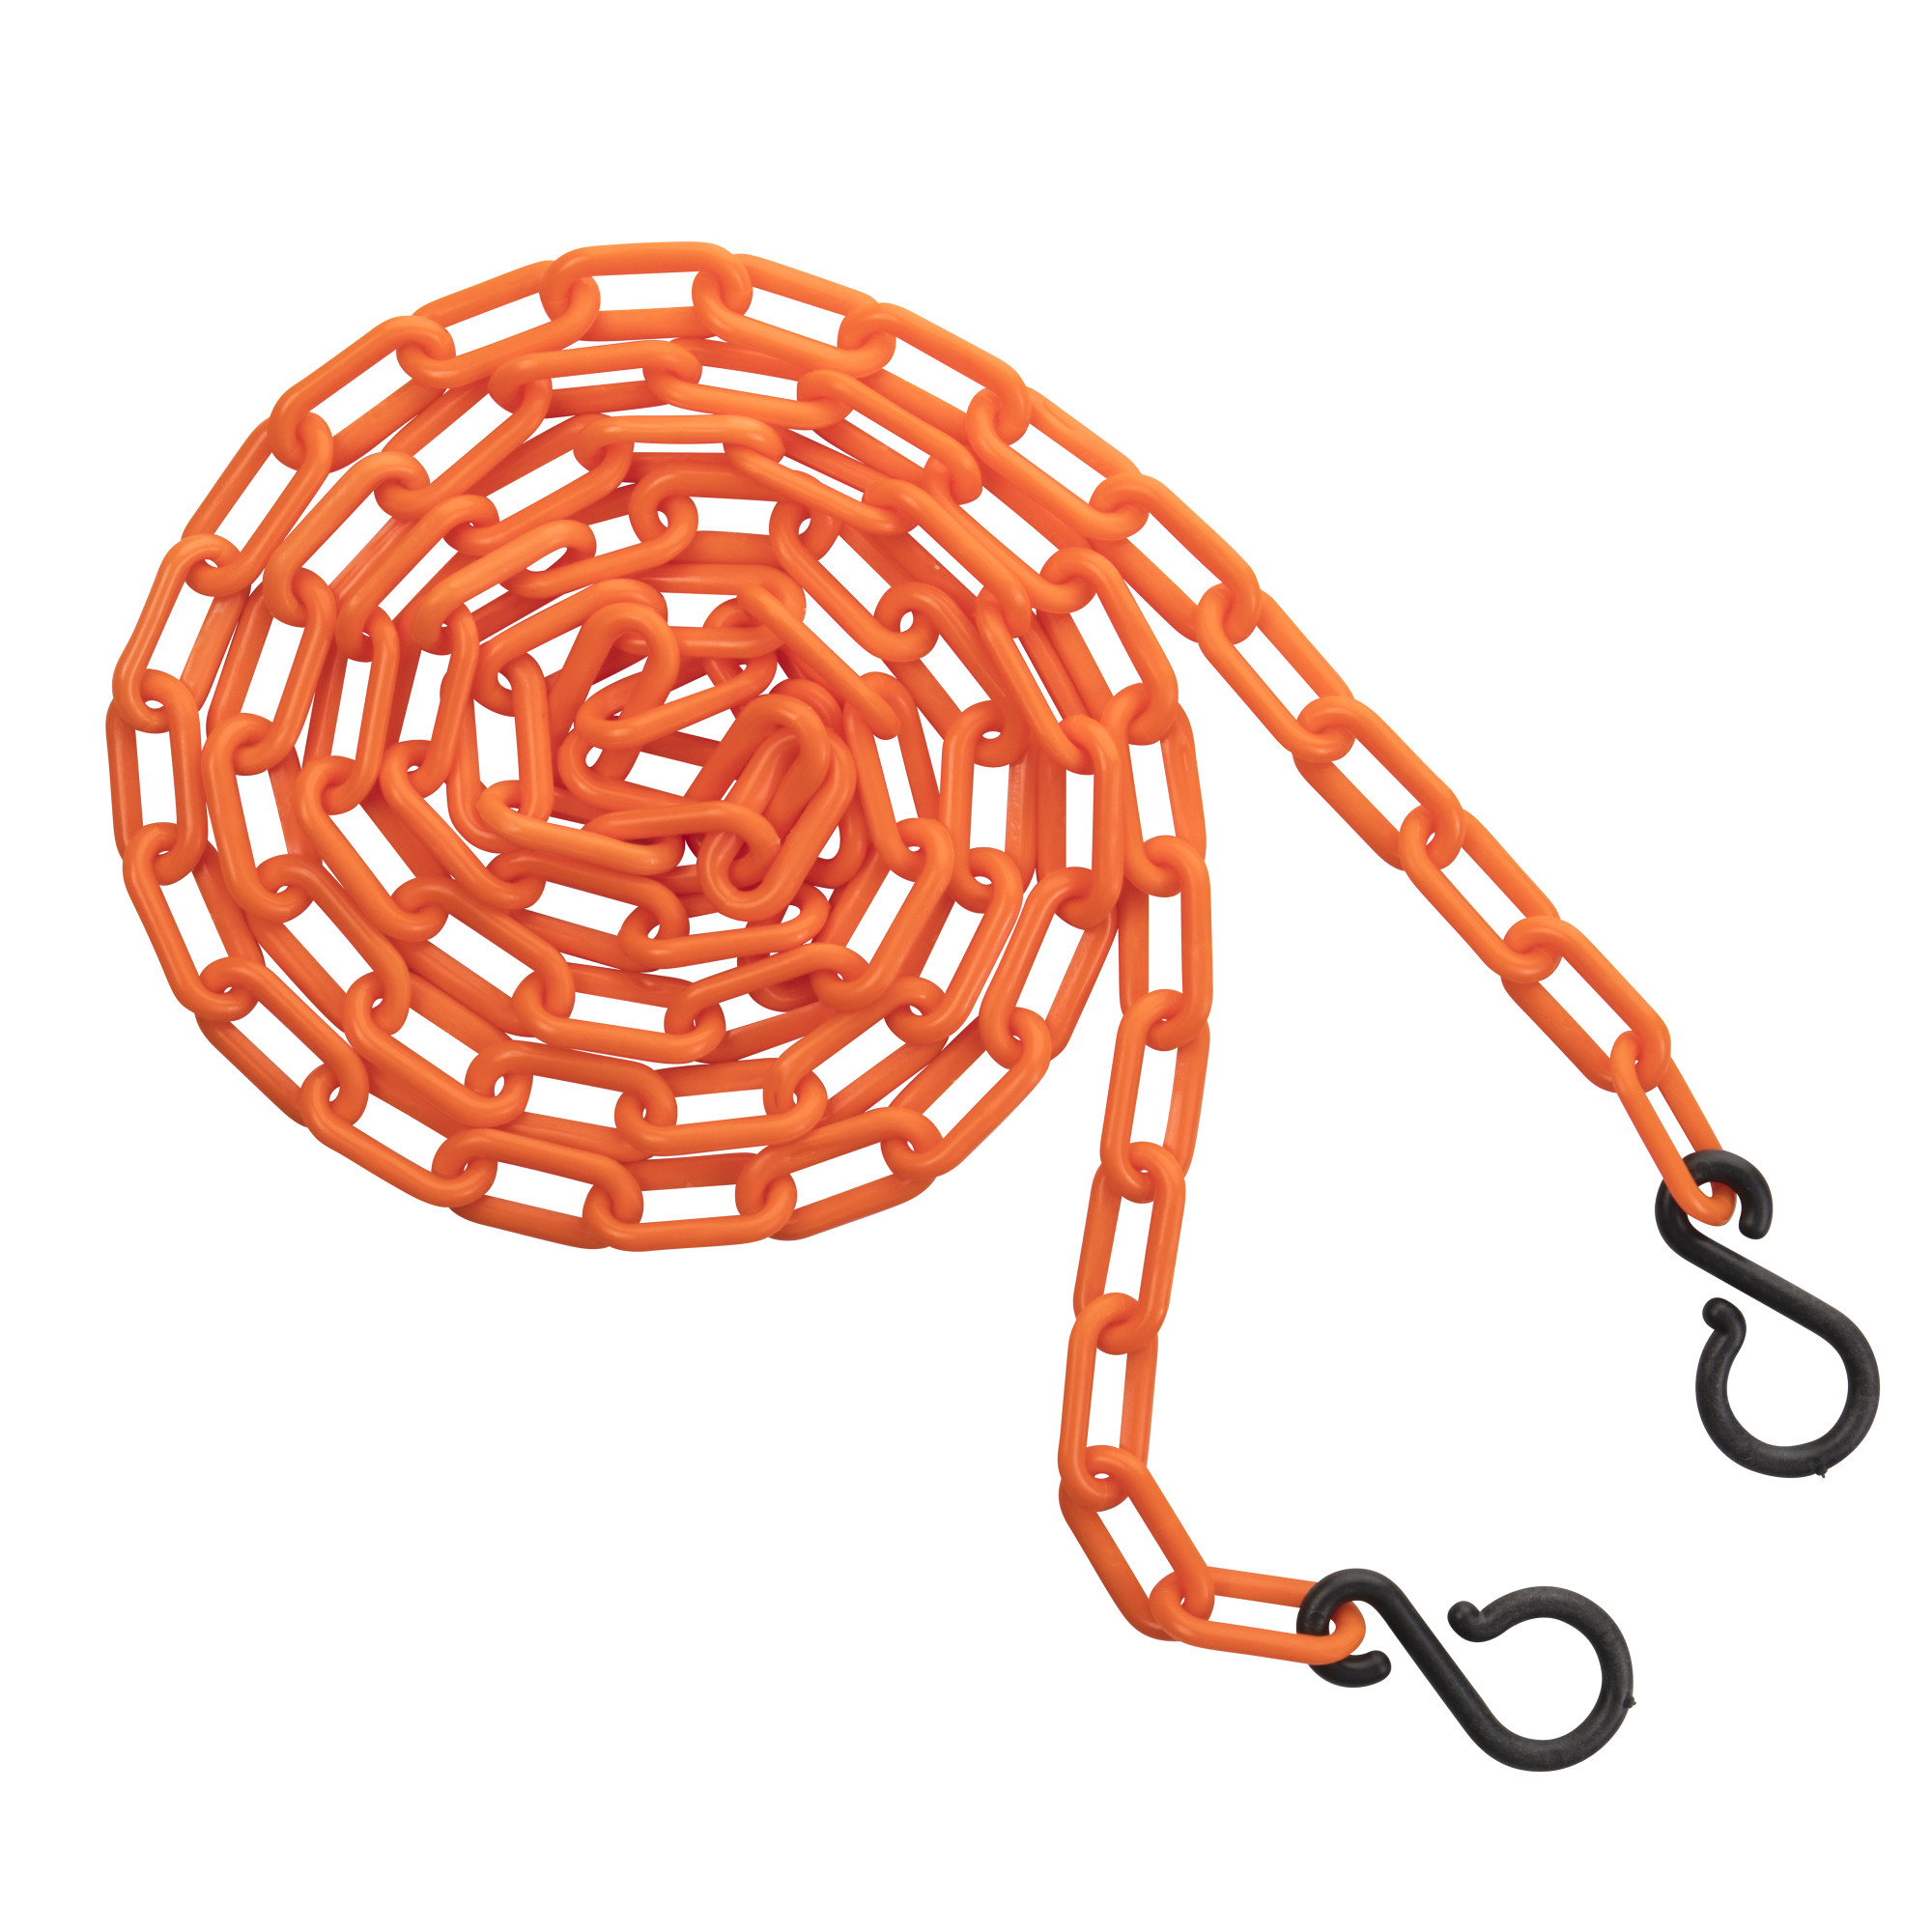 US Weight ChainBoss 2-Inch Plastic Chain – 10 Feet